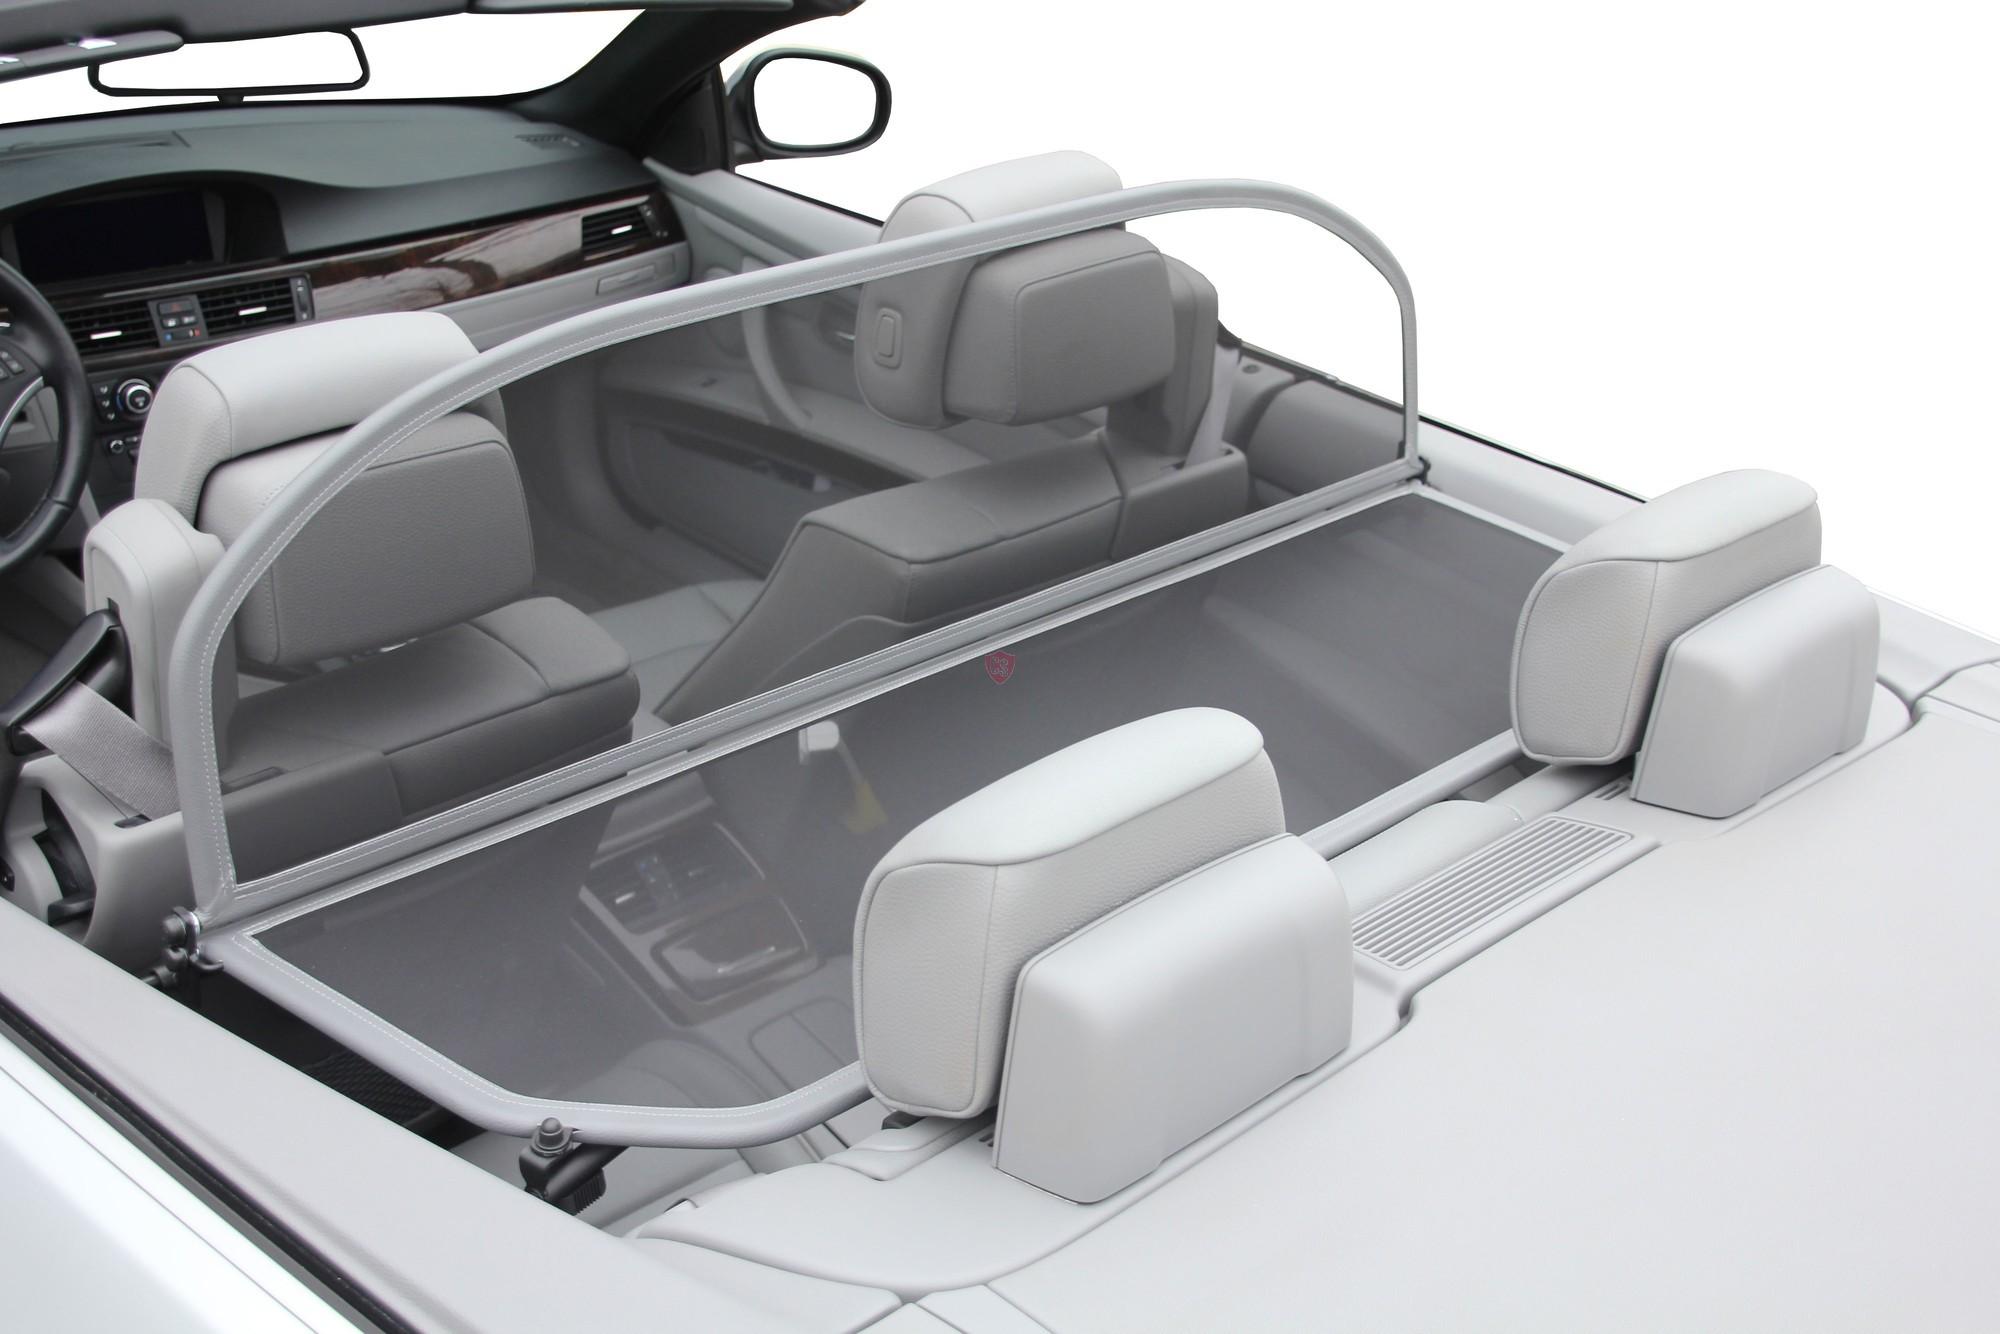 BMW 3 Reihe E93 Windschott 2007-2013 | Cabrio Supply